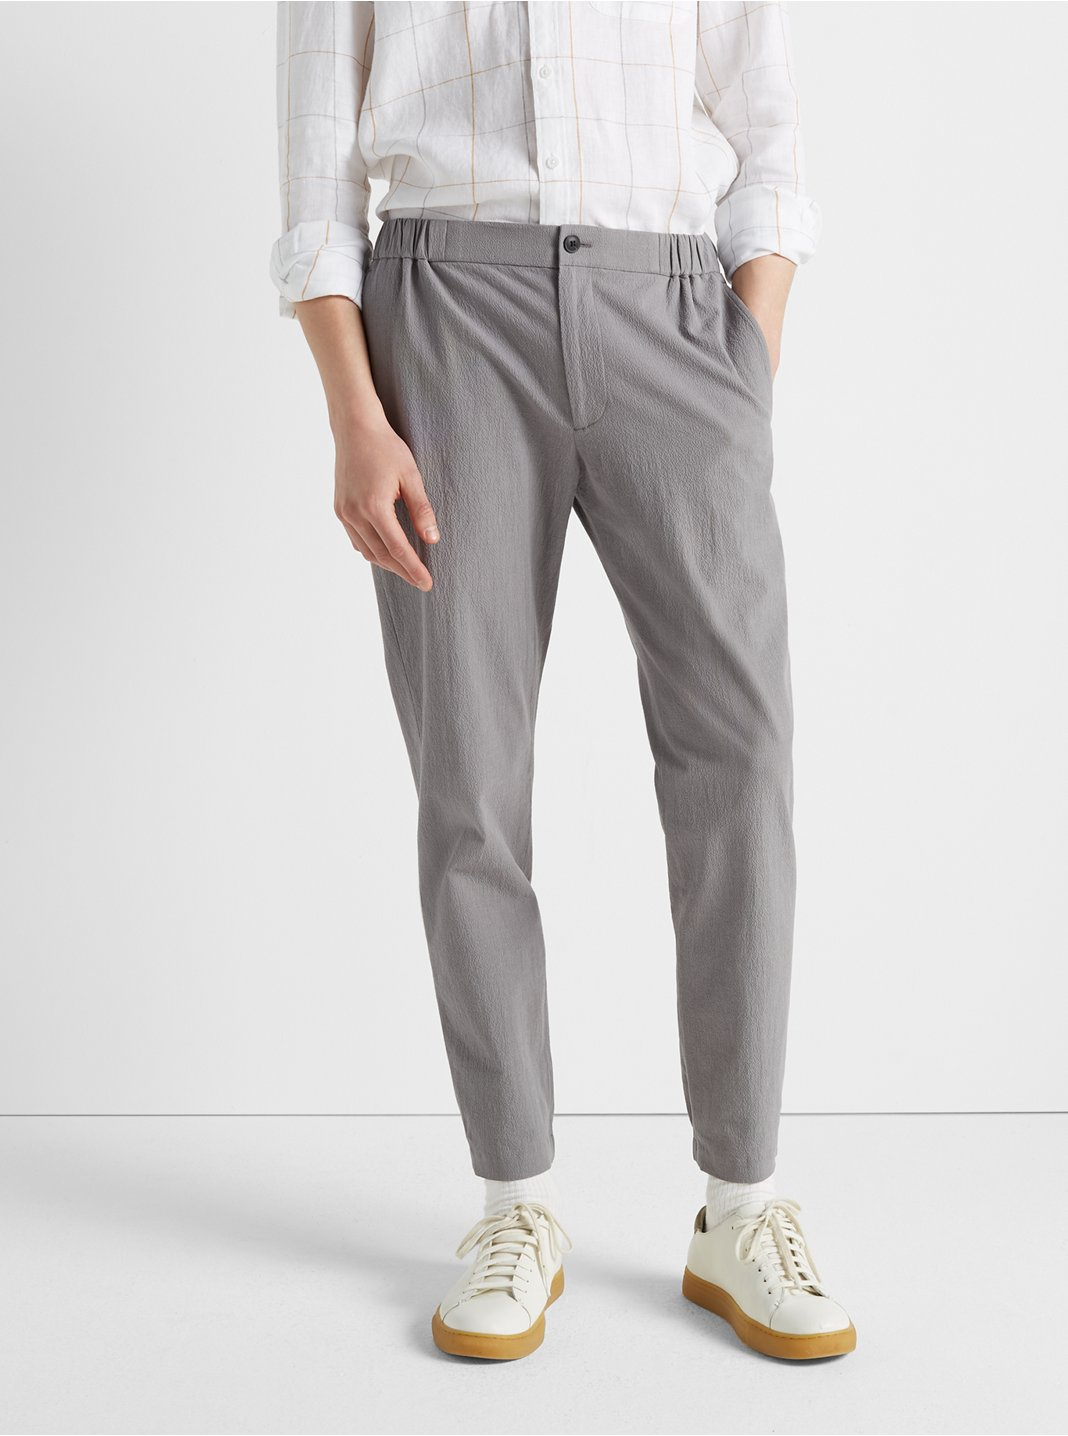 Lex Textured Pant